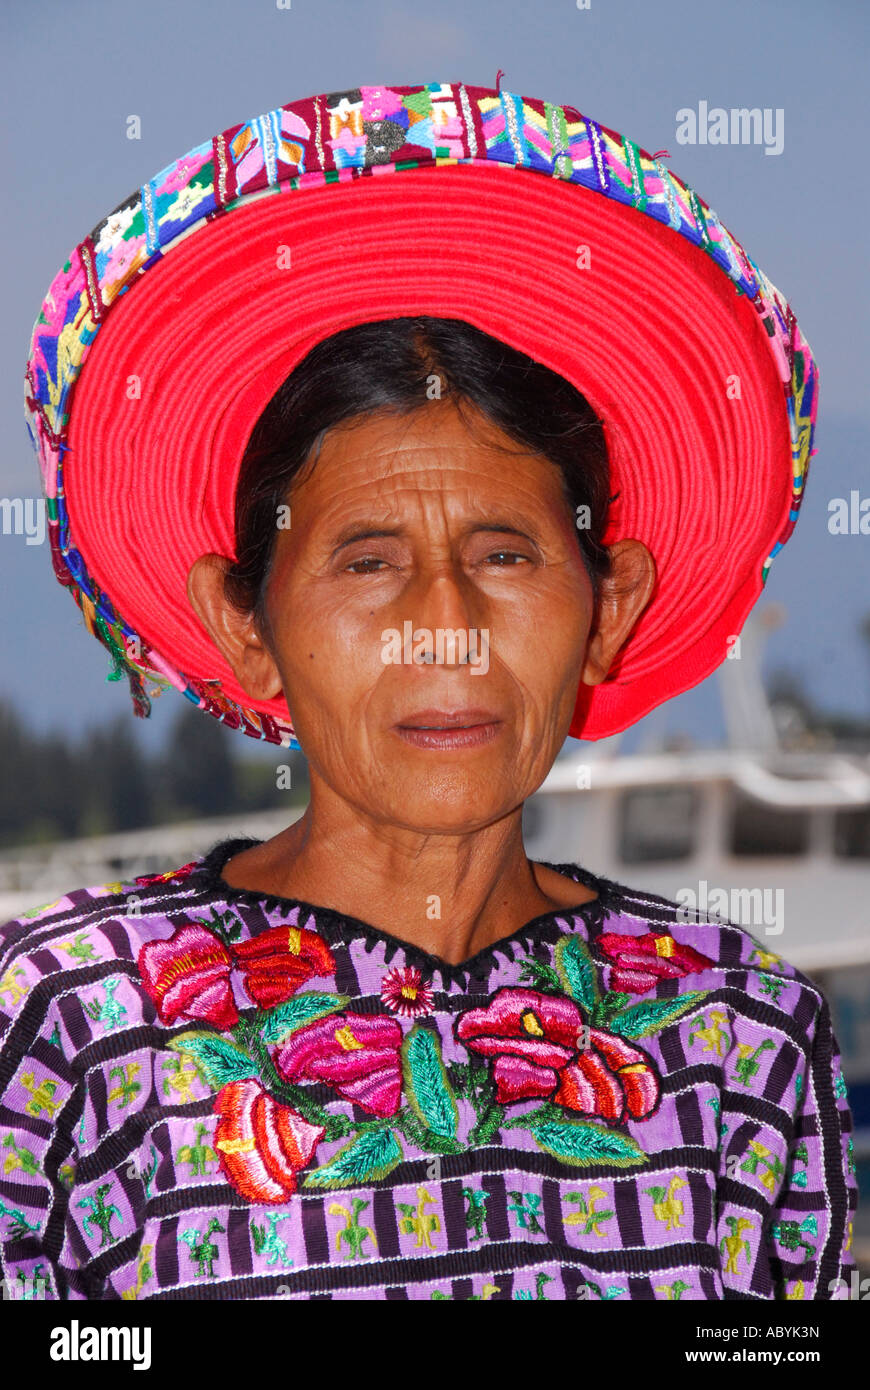 Indigenous Tzutujil woman, Santiago de Atitlan, Lake Atitlan, Guatemala, Central America - Stock Image